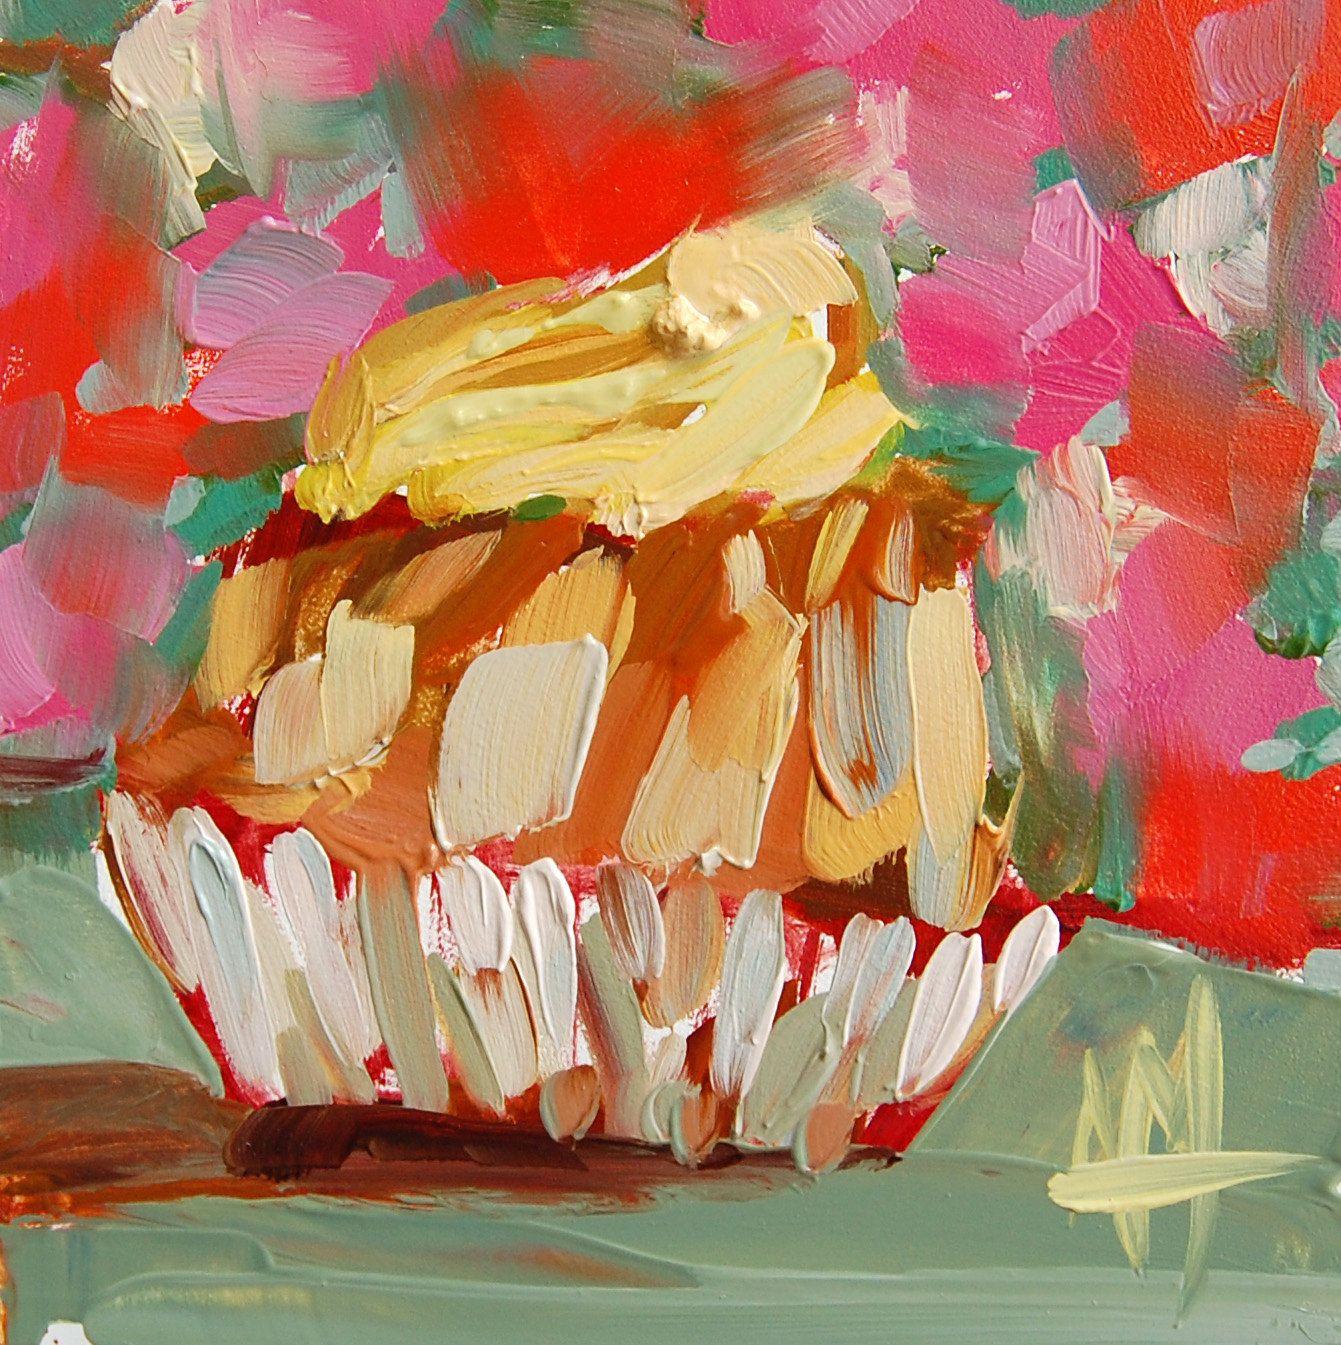 Lemon Bundt Mini Cake original sweets still life oil painting by Angela Moulton 4 x 4 inch on panel pre-order by prattcreekart on Etsy